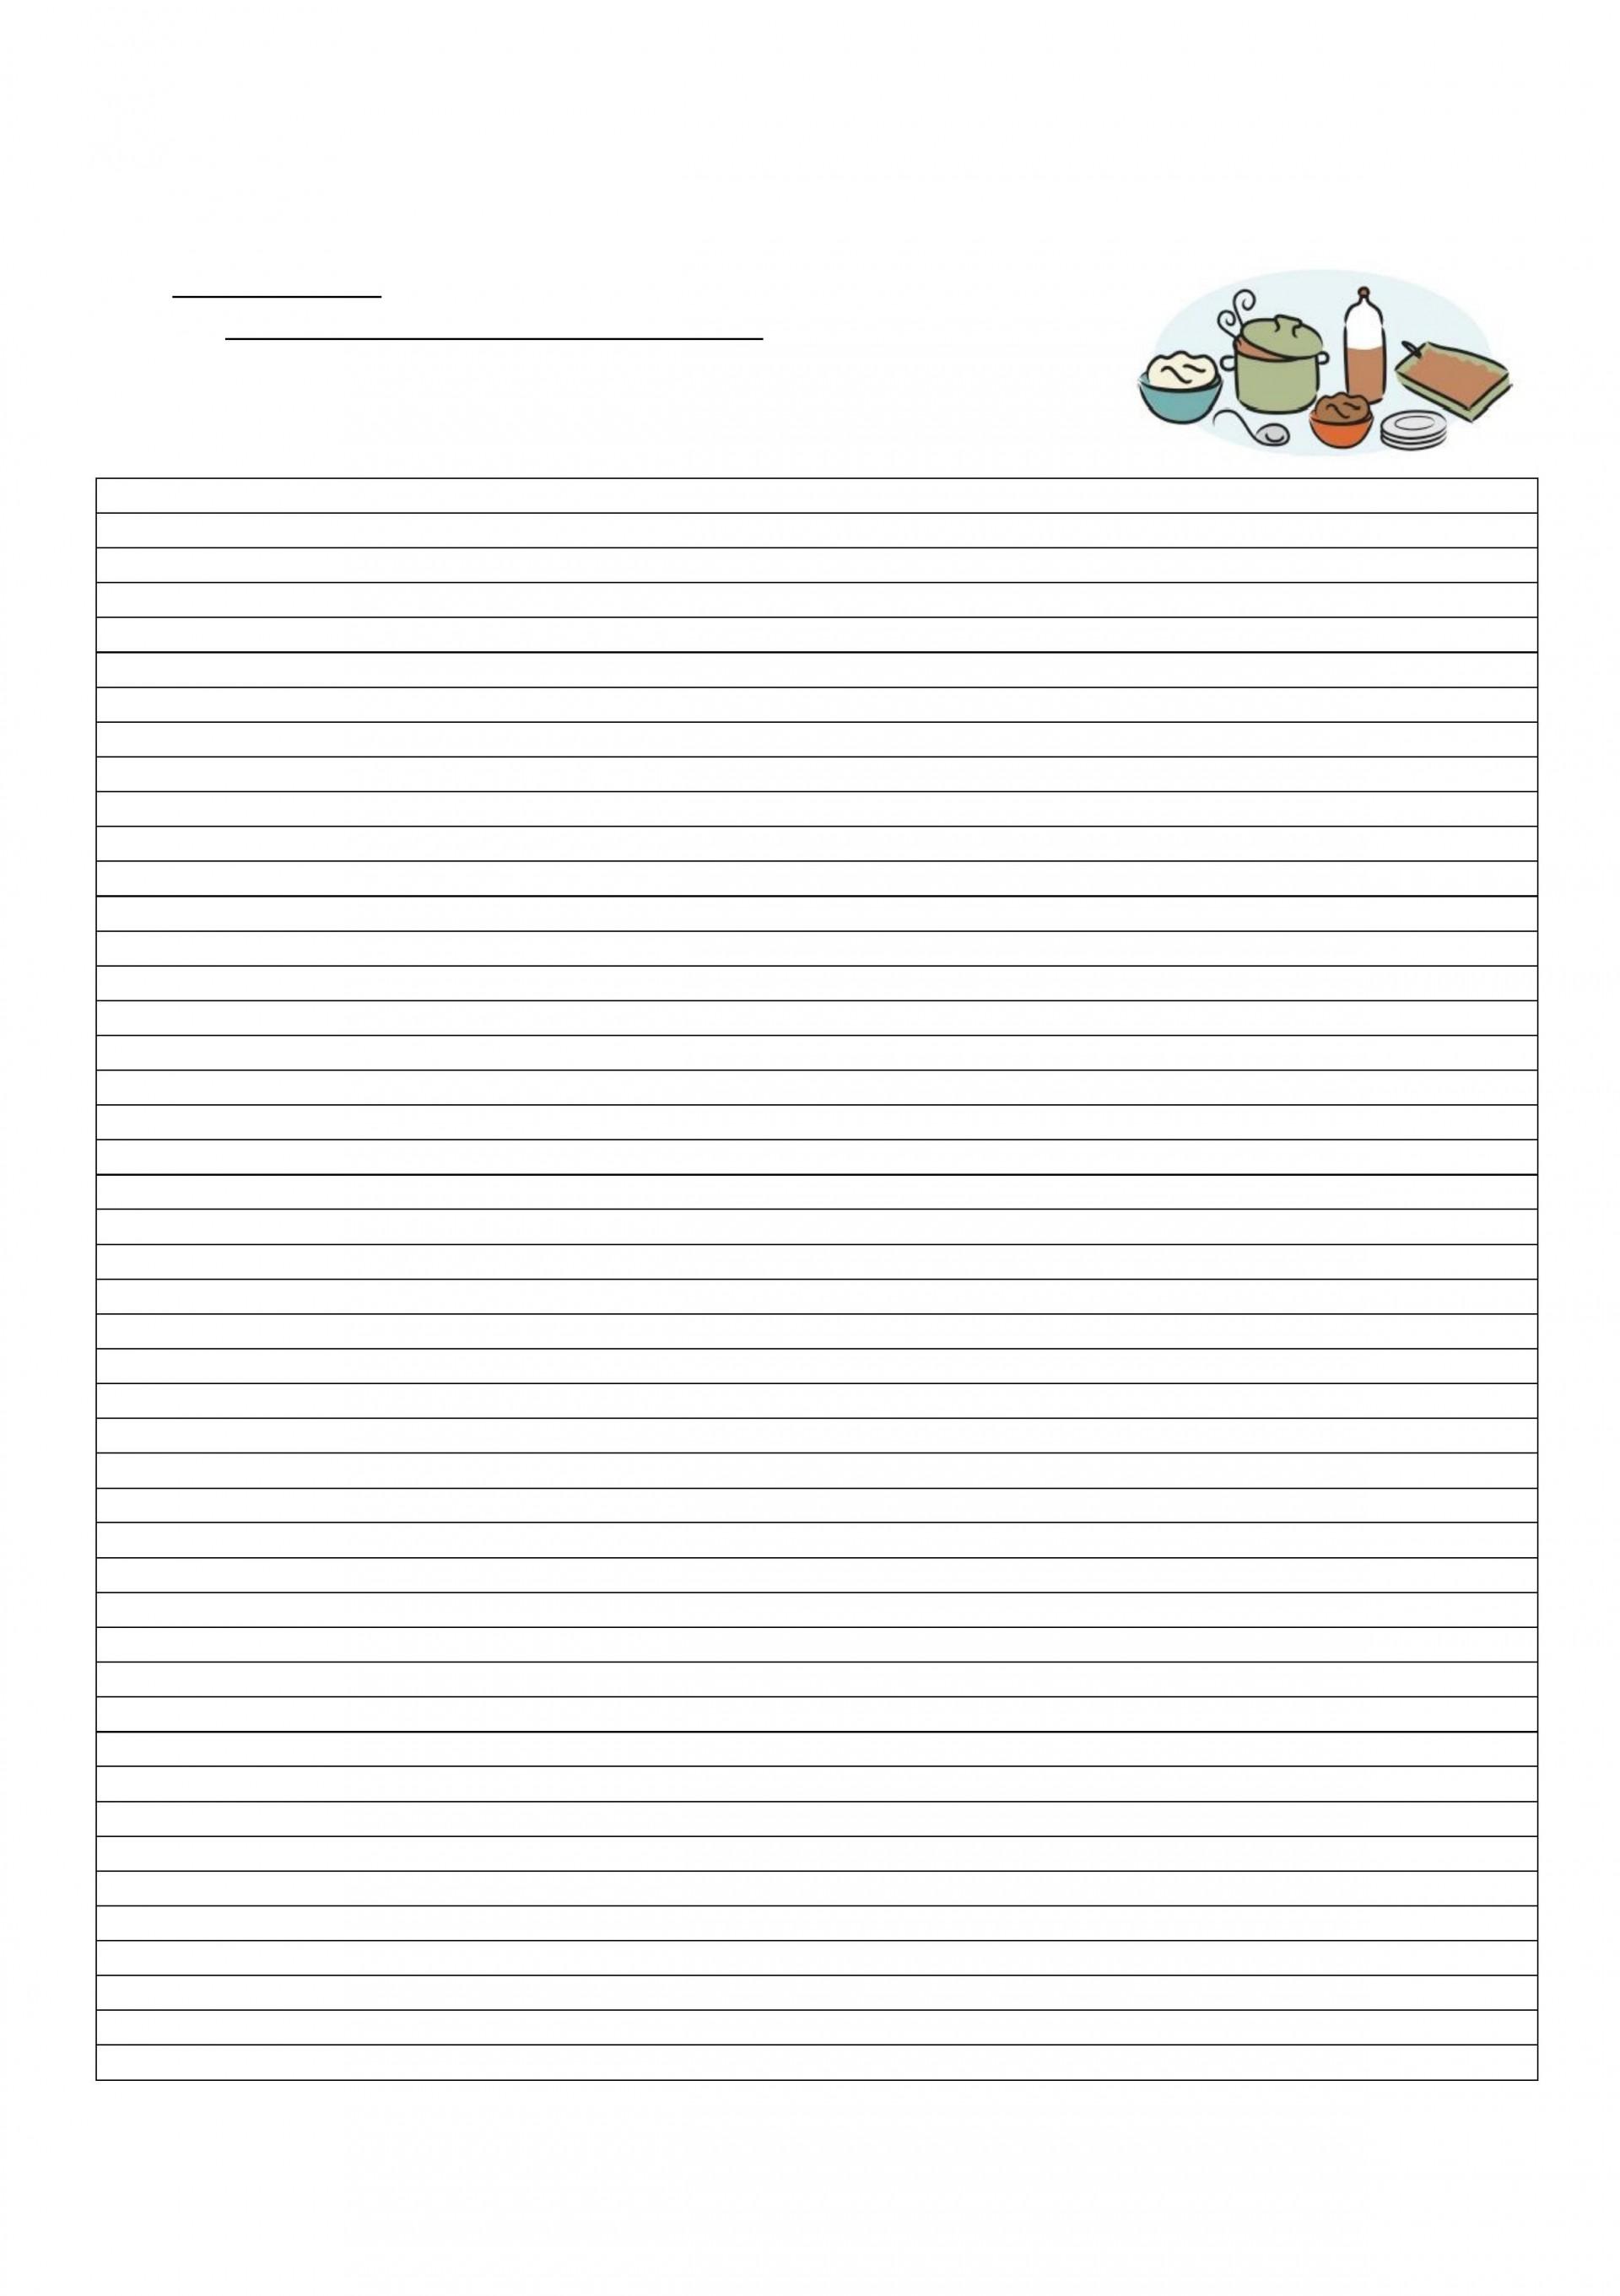 003 Breathtaking Potluck Sign Up Sheet Template Example  Pdf Google Doc Free Printable1920